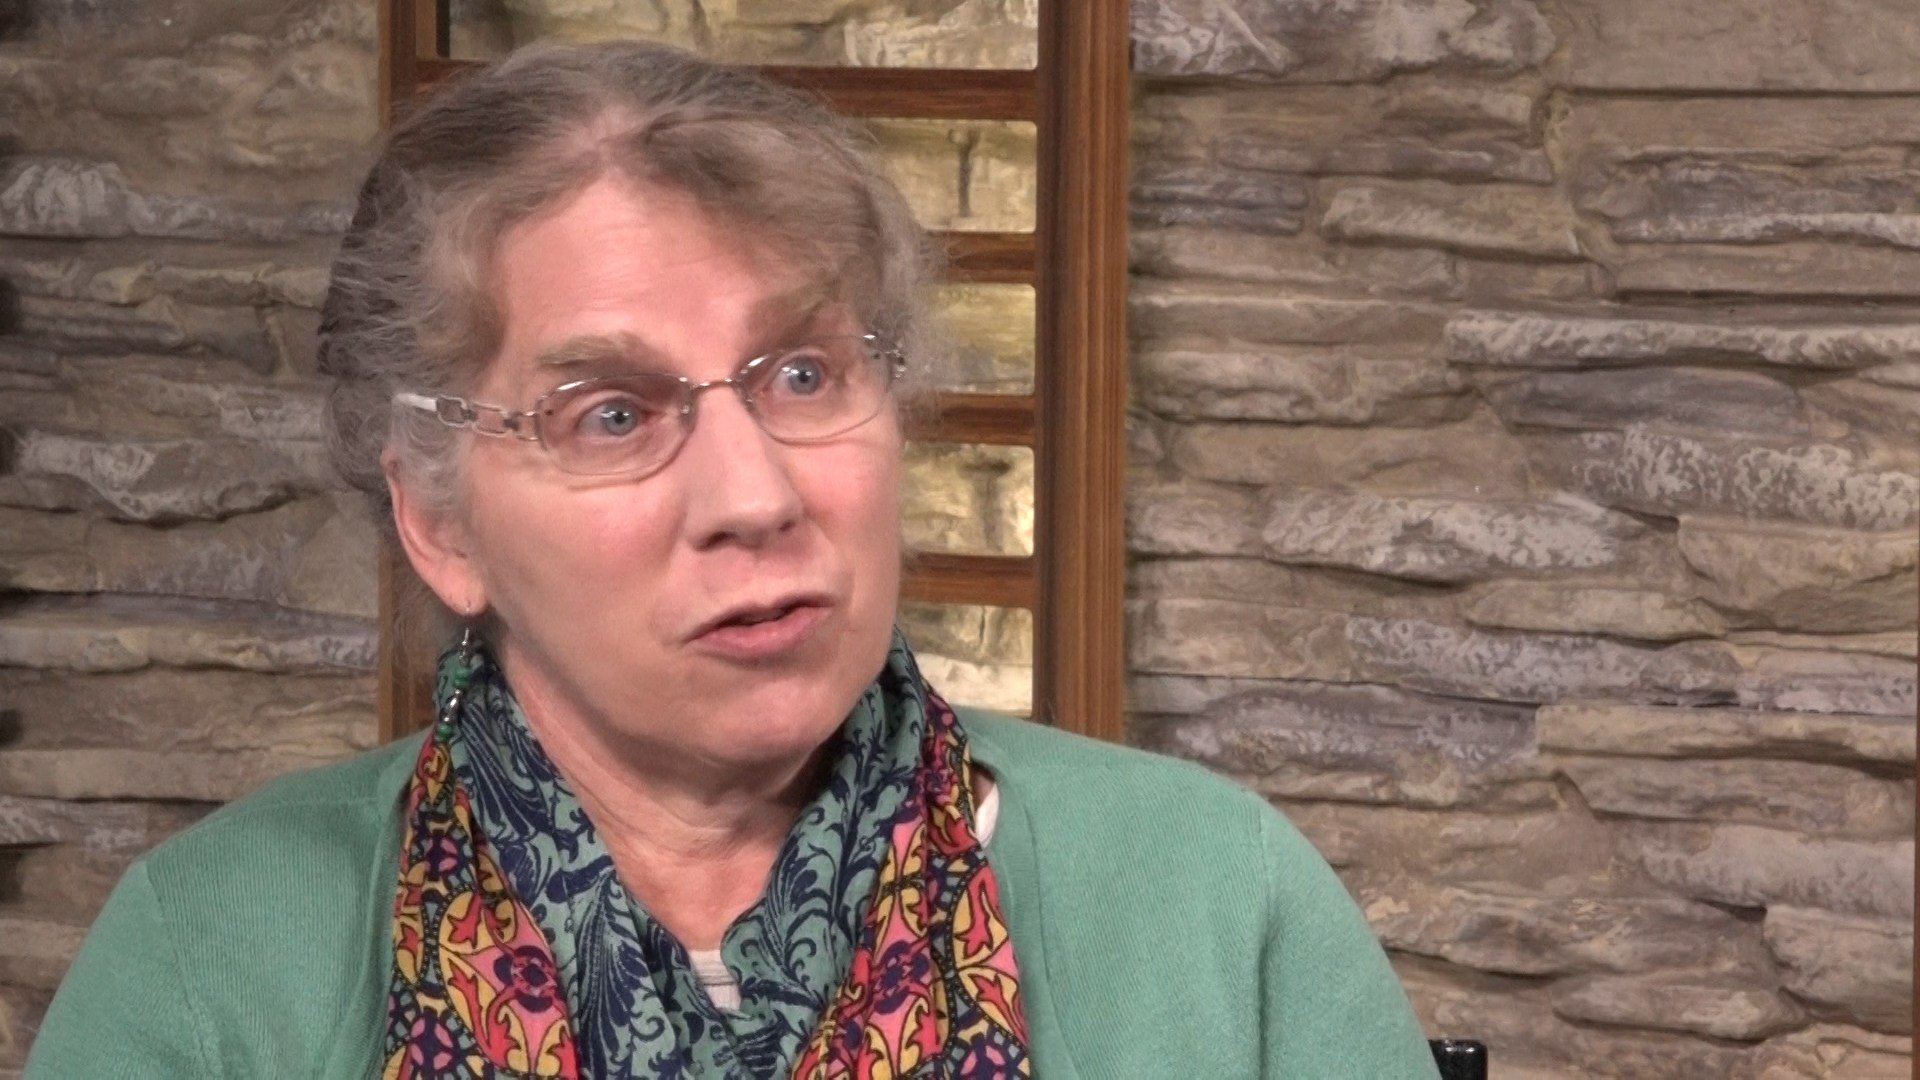 State Rep. Janet Ellis, D-Helena